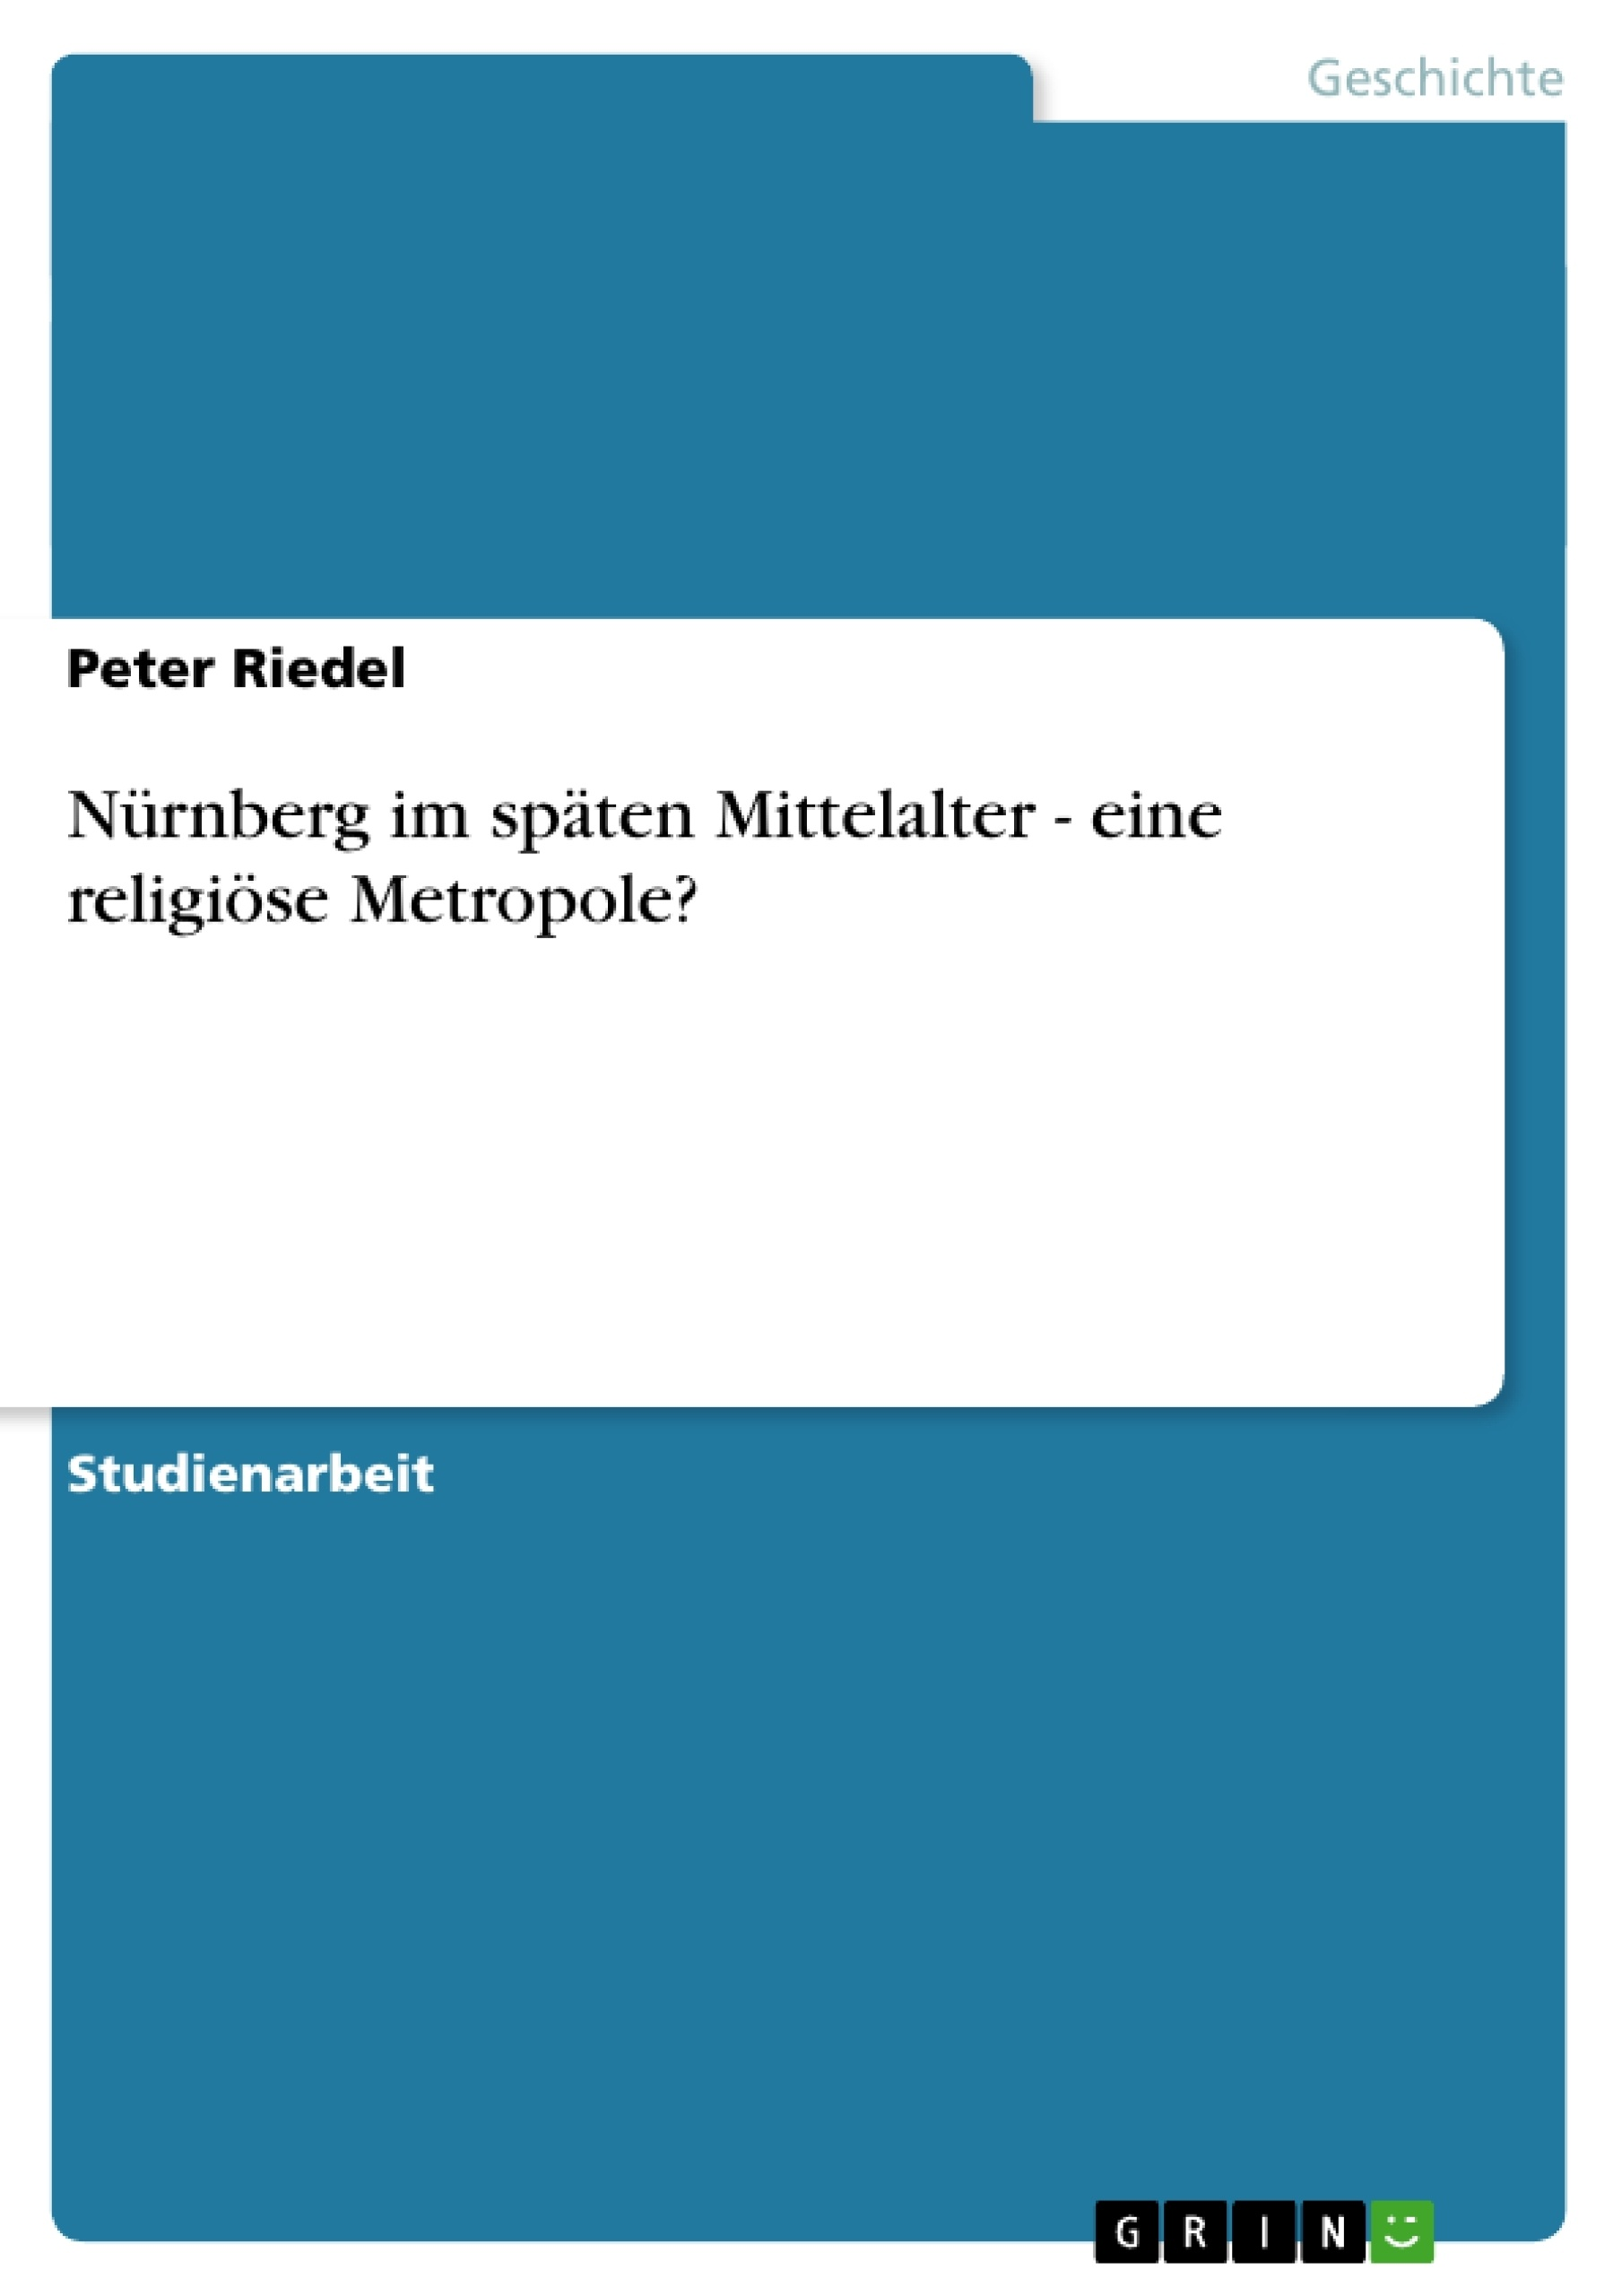 Titel: Nürnberg im späten Mittelalter - eine religiöse Metropole?